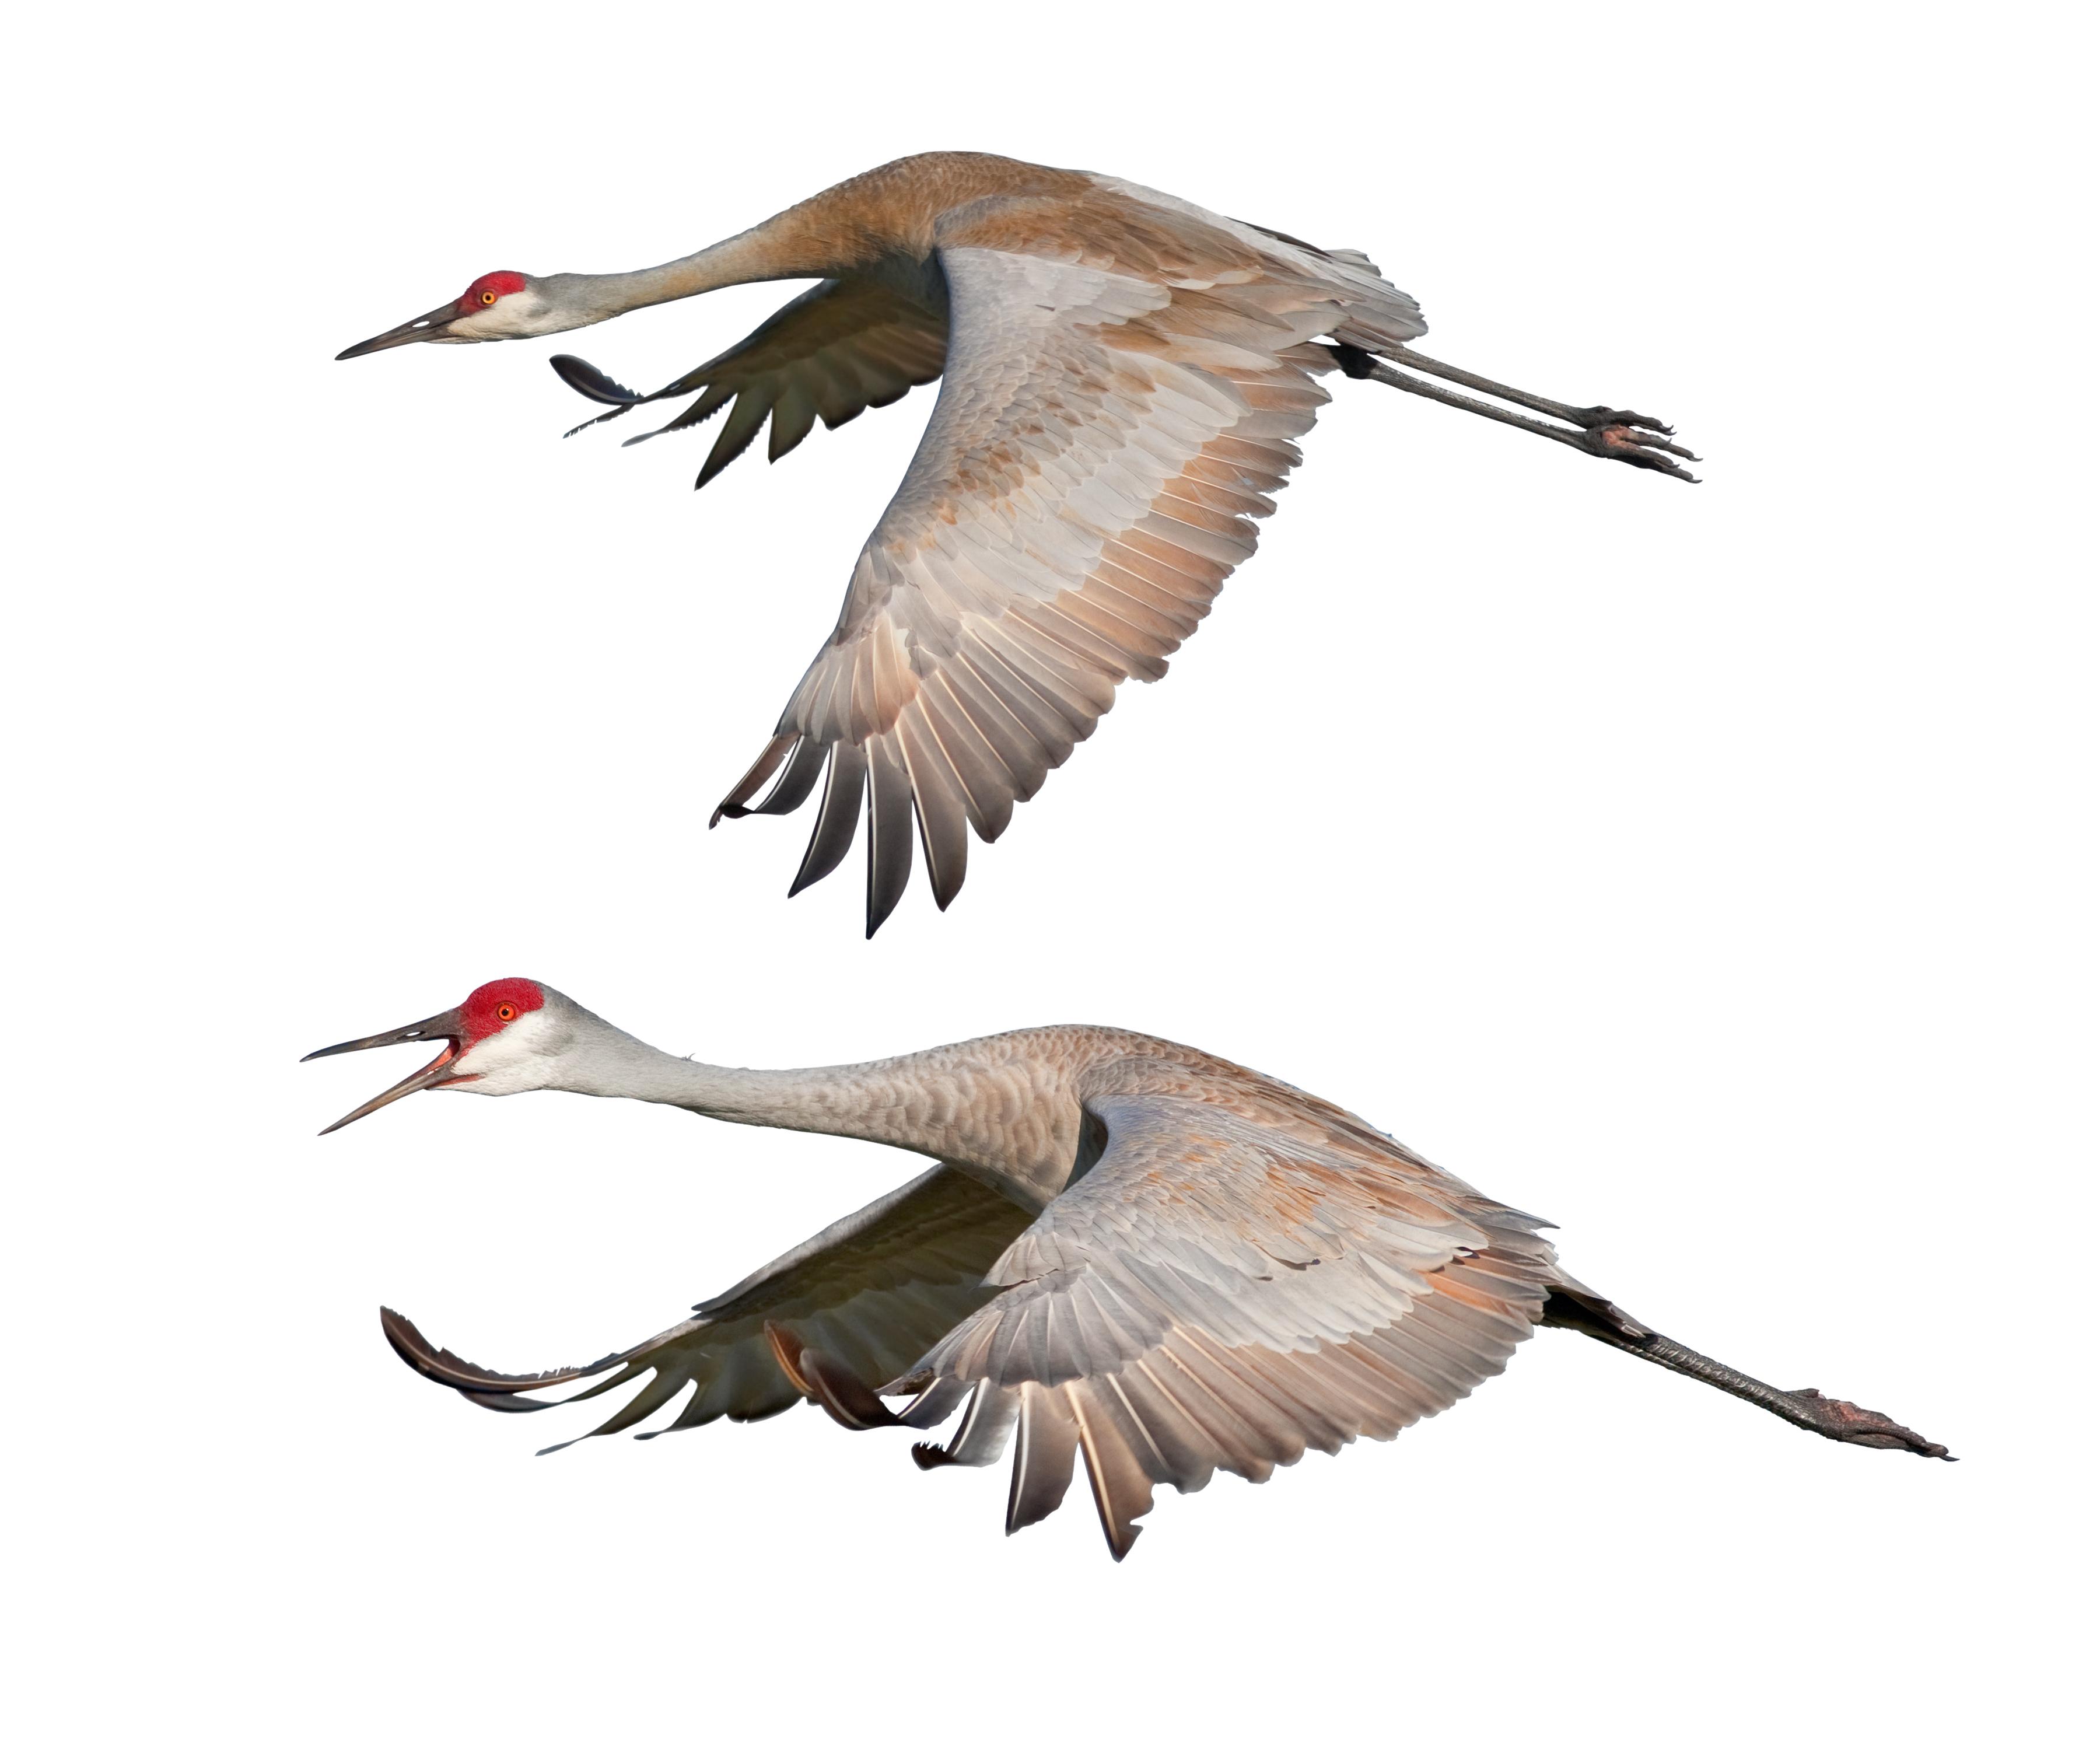 Flying cranes (birds)